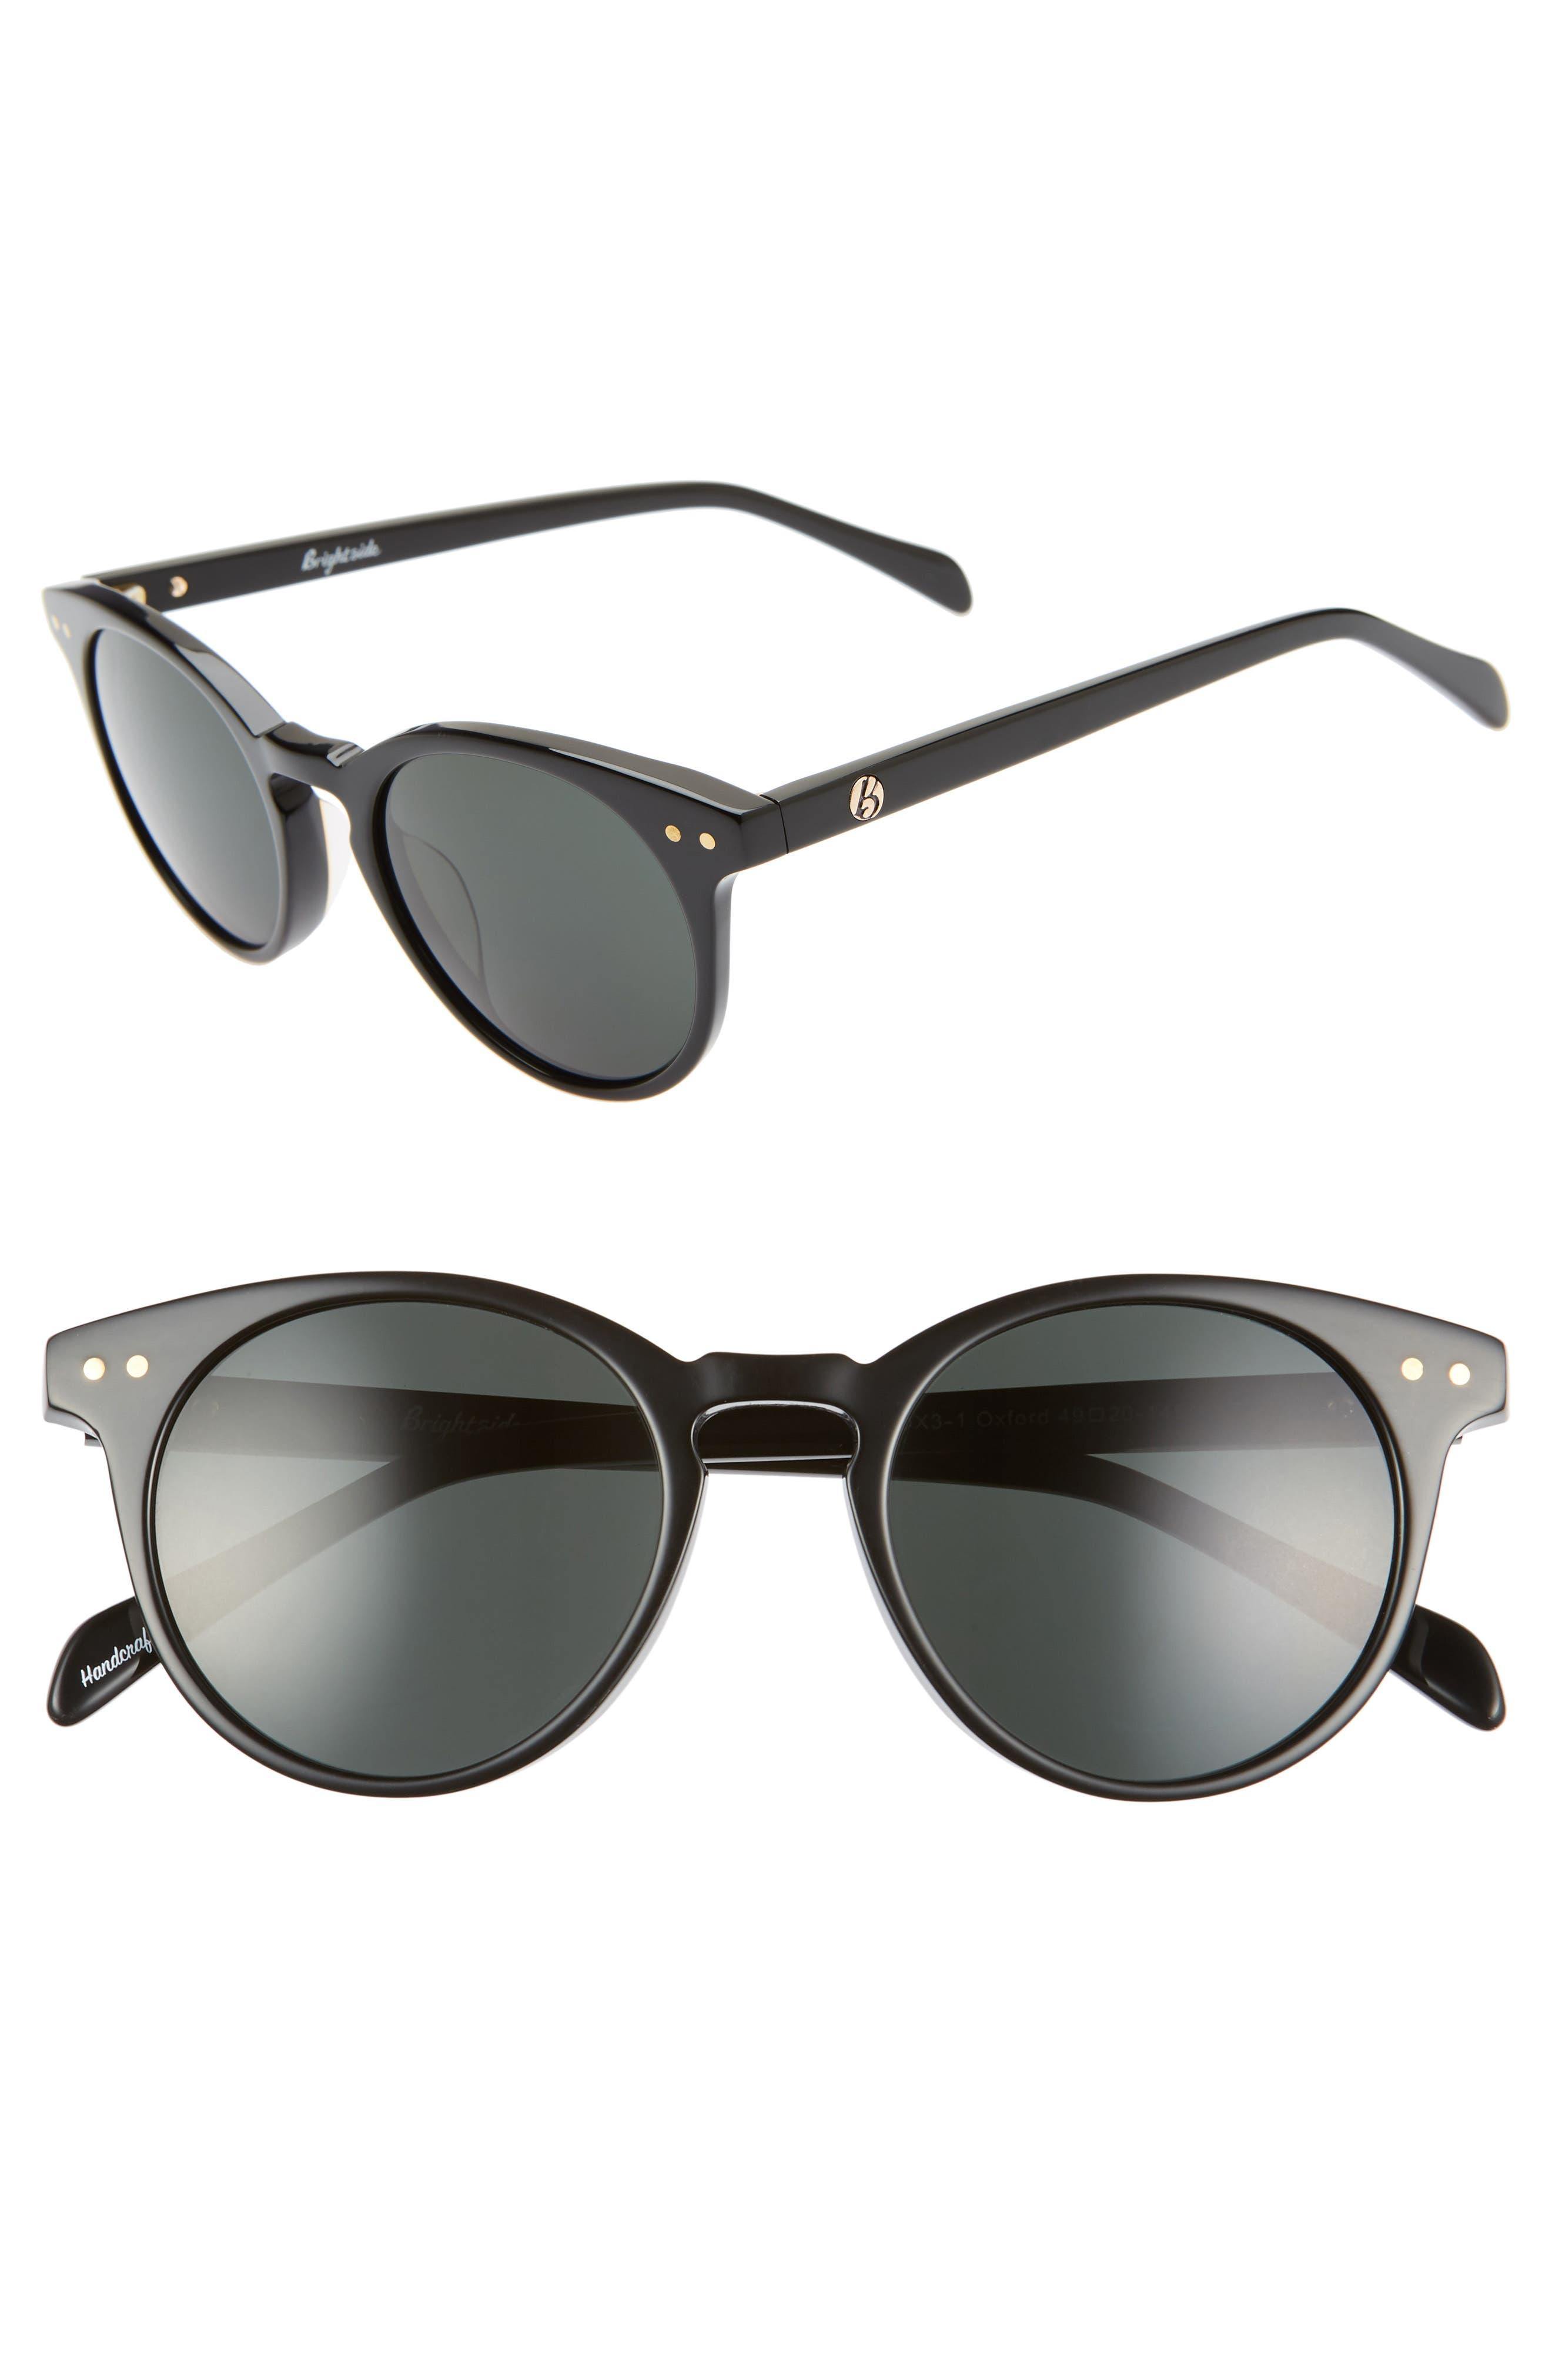 Oxford 49mm Sunglasses